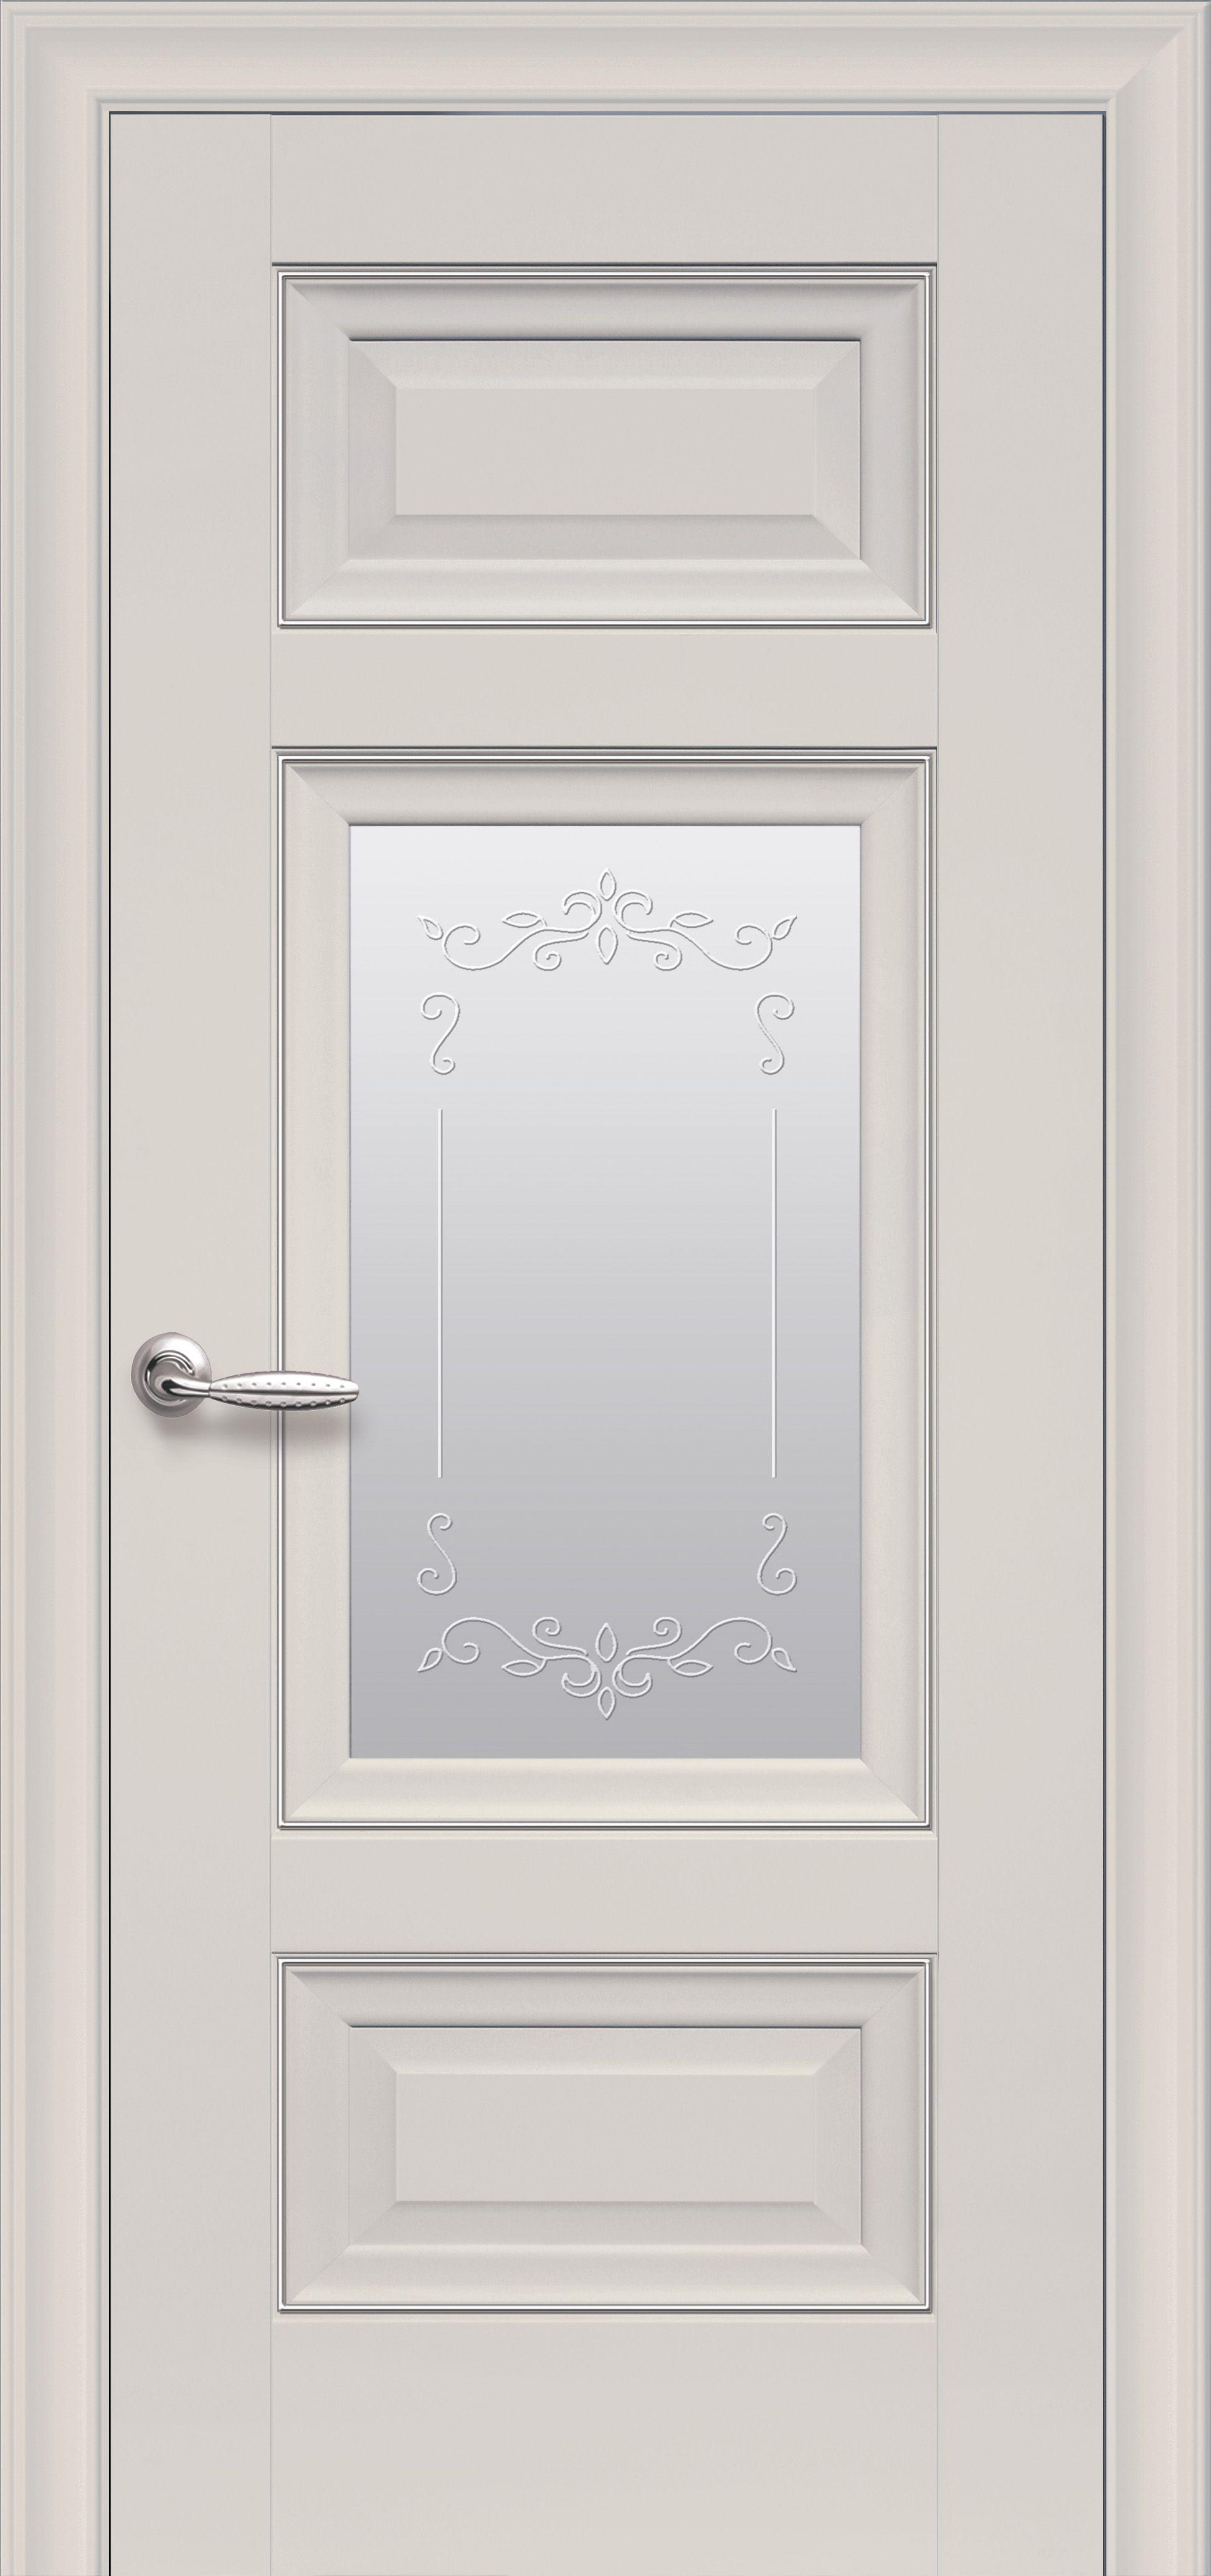 Межкомнатные двери Шарм Со стеклом сатин, молдингом и рисунком